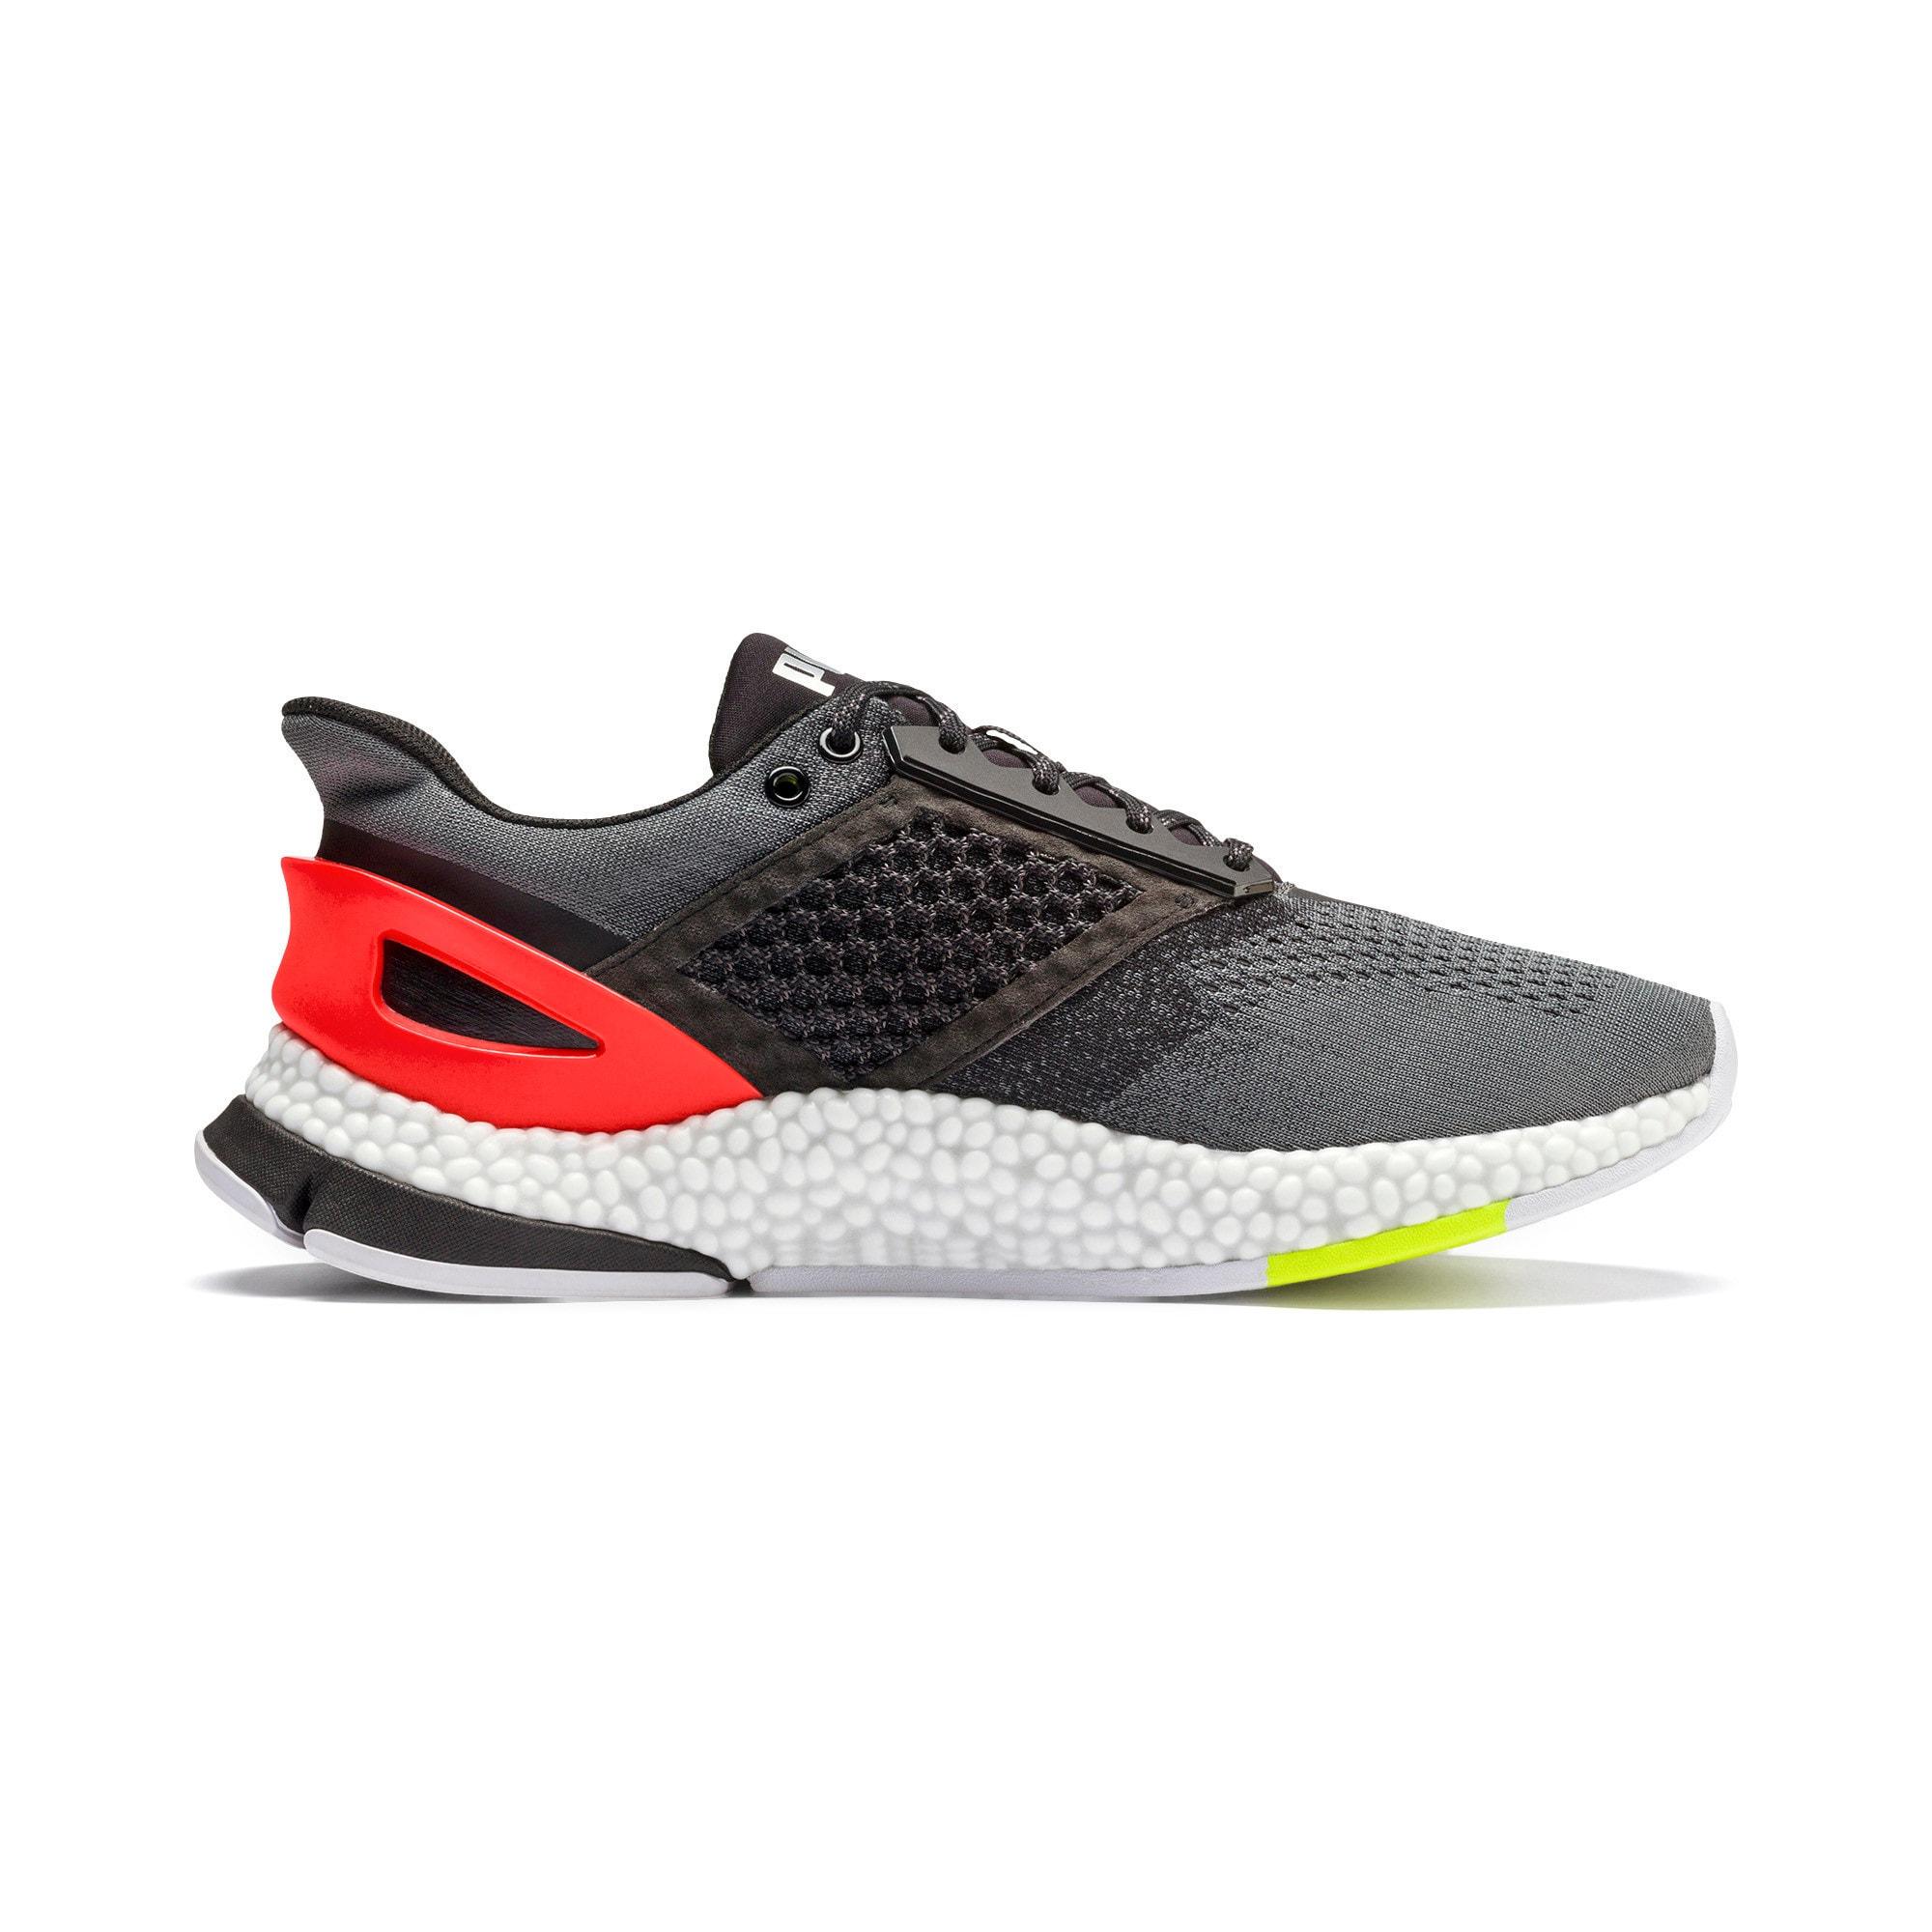 Thumbnail 5 of HYBRID NETFIT Astro Men's Running Shoes, CASTLEROCK-Puma Blck-Ngy Red, medium-IND